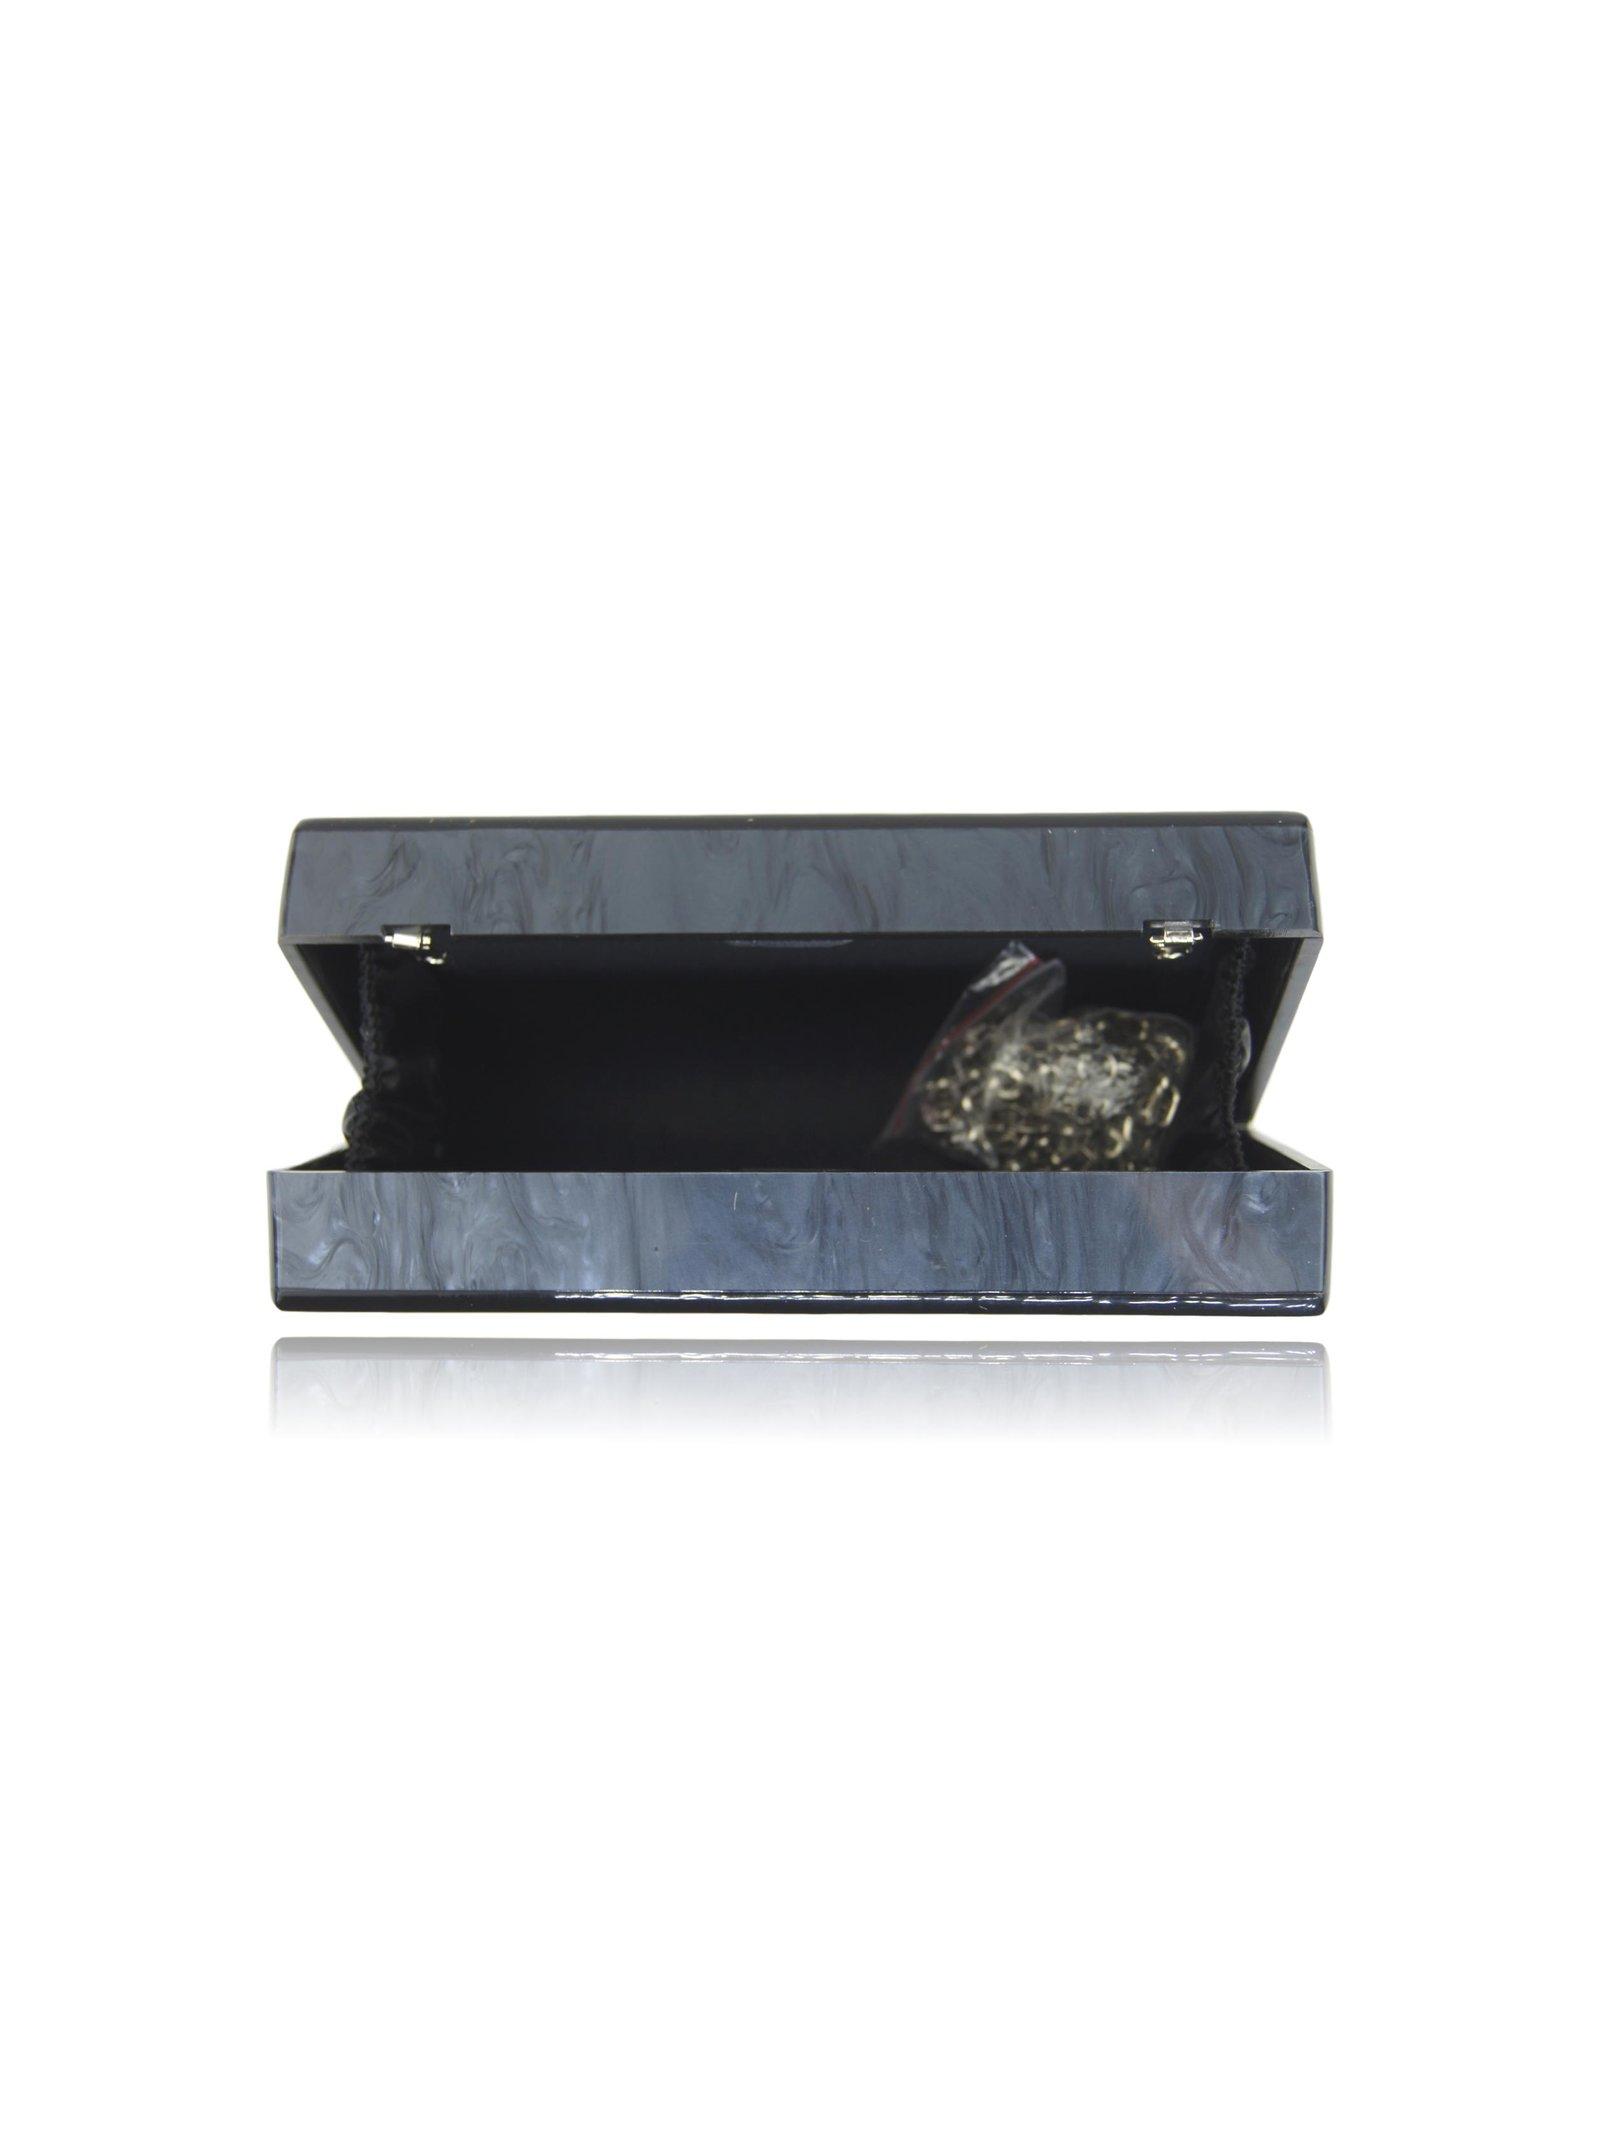 Milanblocks Black Silver Skull Acrylic Clutch